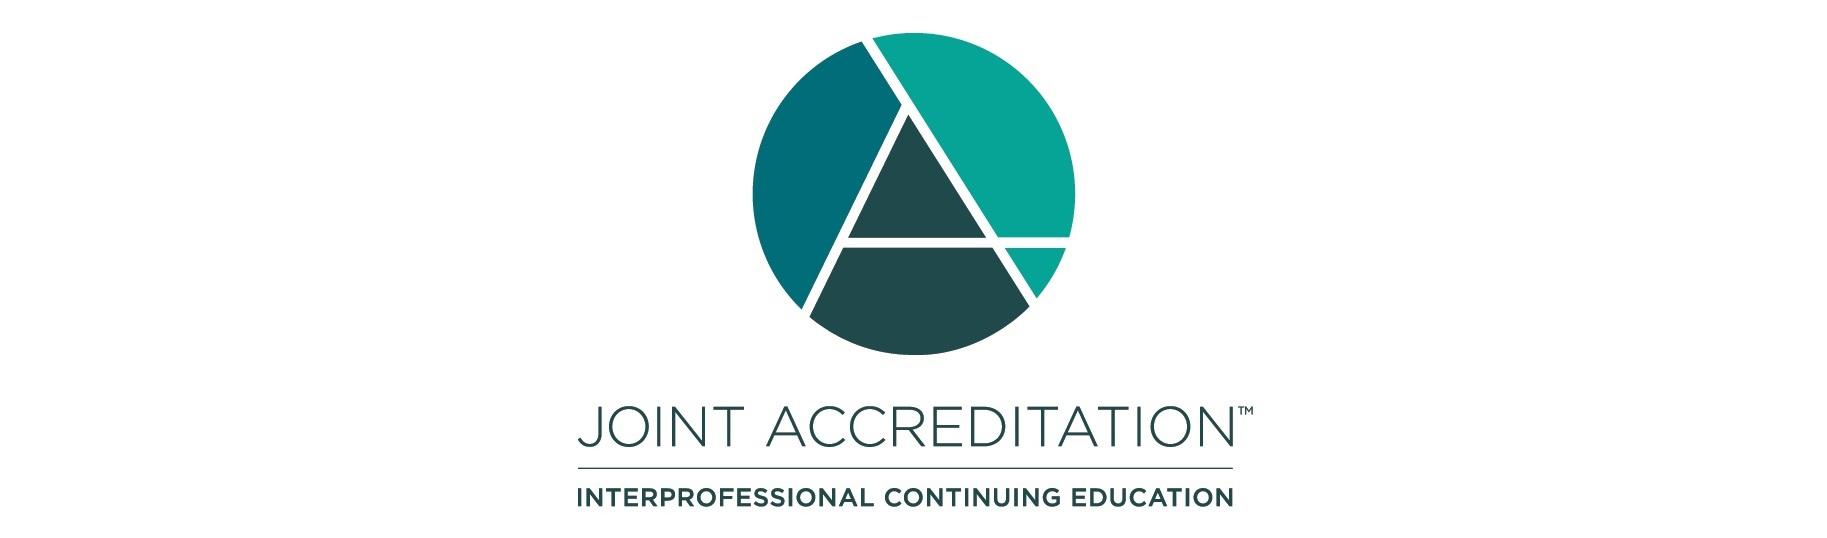 2019 Joint Accreditation Leadership Summit